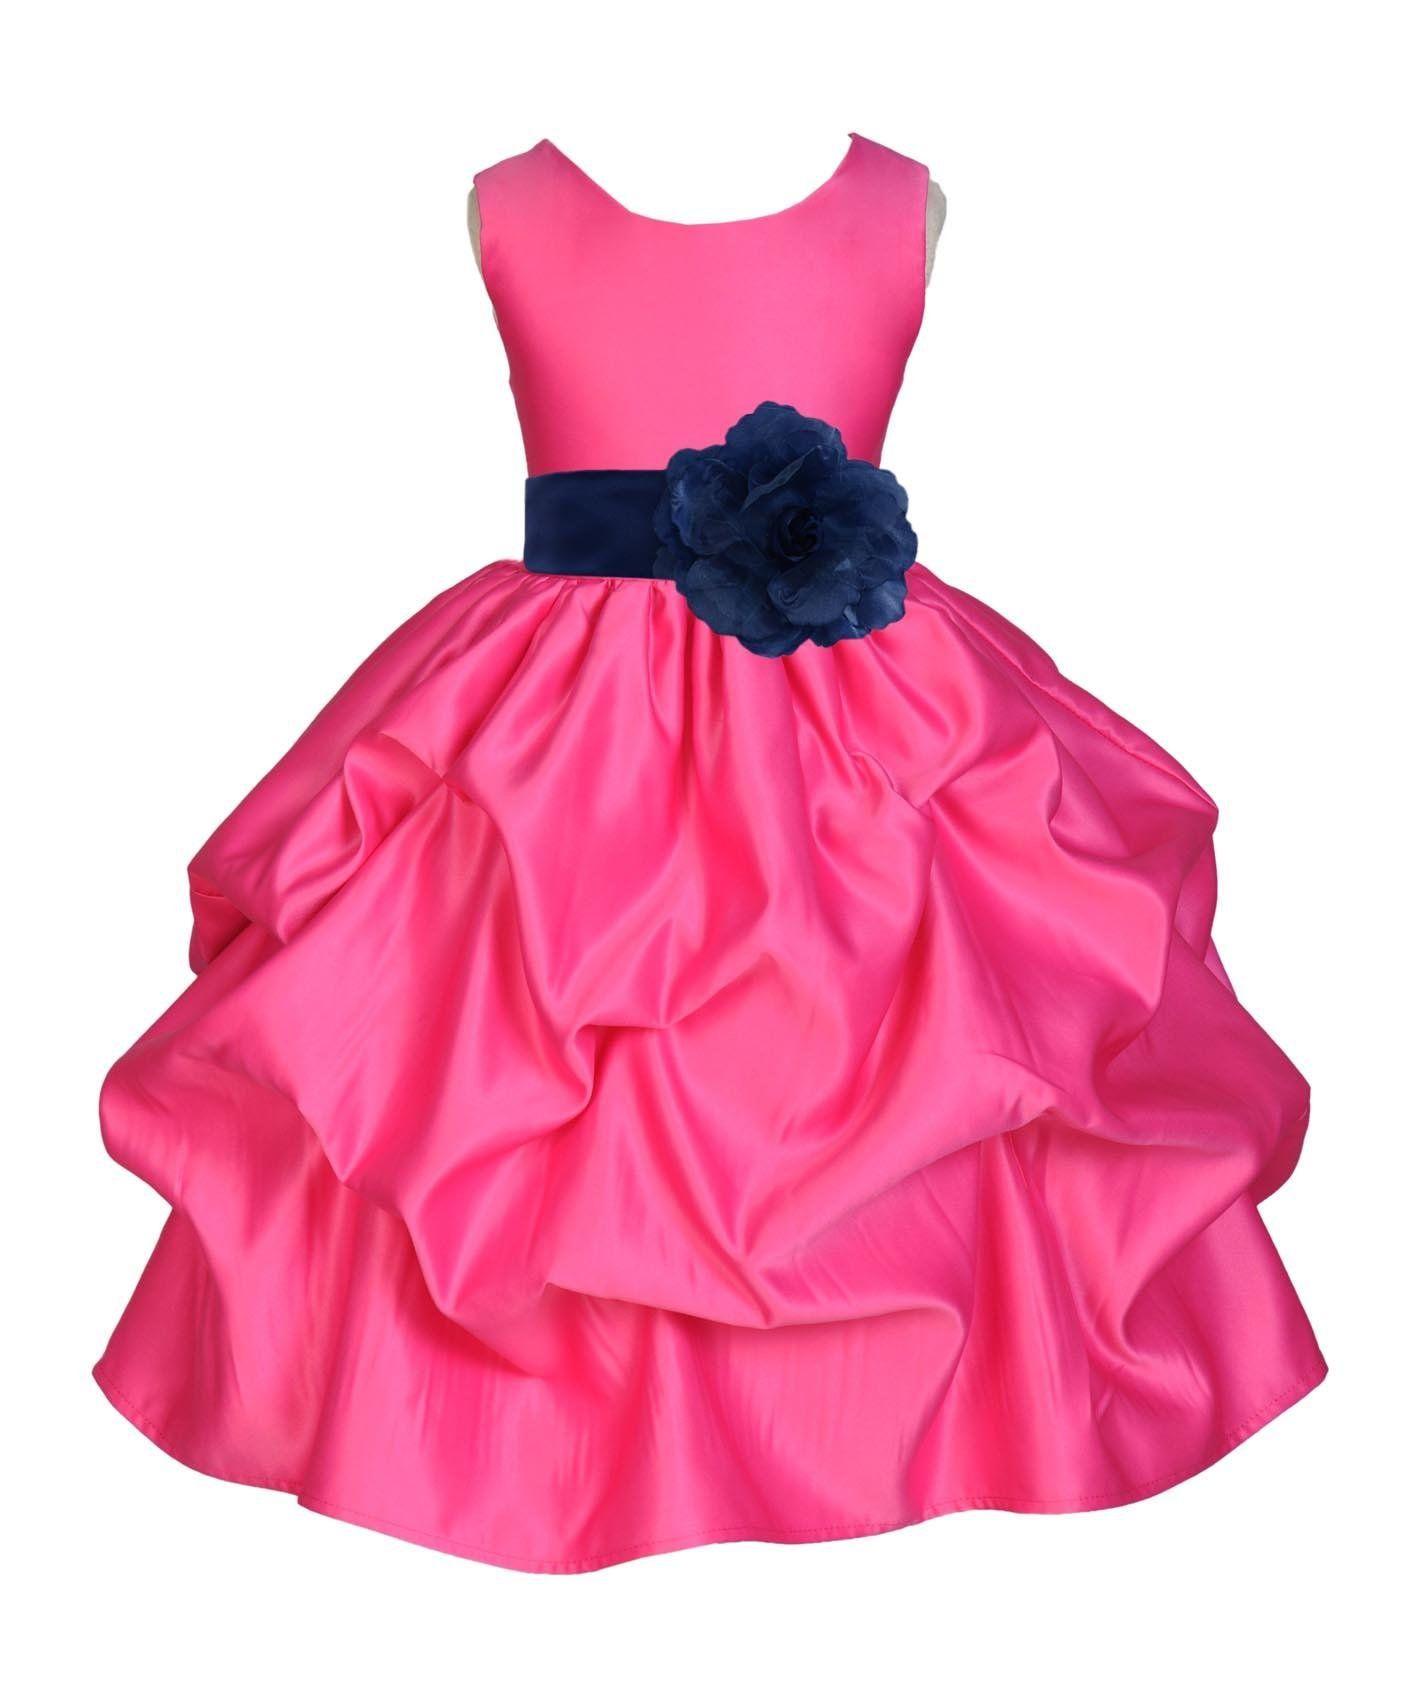 Wedding Pageant Fuchsia Hot Pink Pick Up Kid Flower Girl Dress 208t